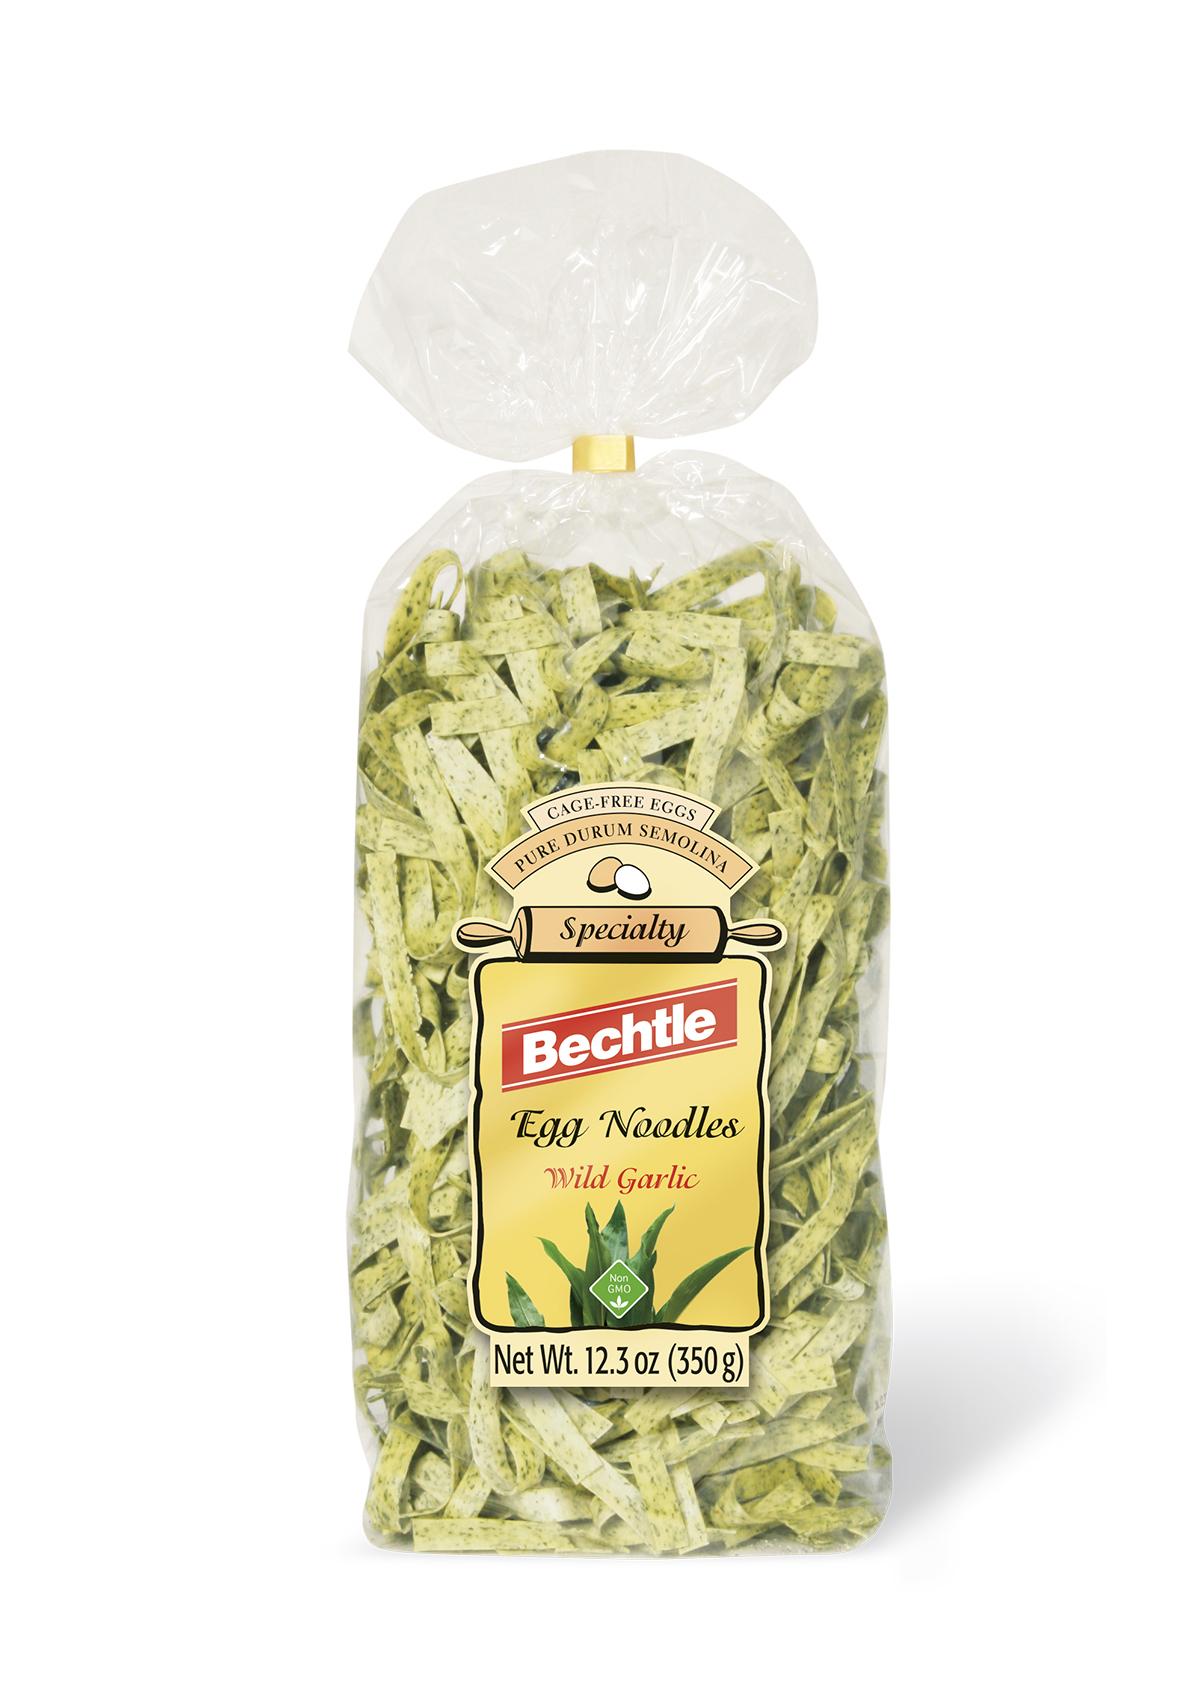 Bechtle Extra Broad Wild Garlic Noodles